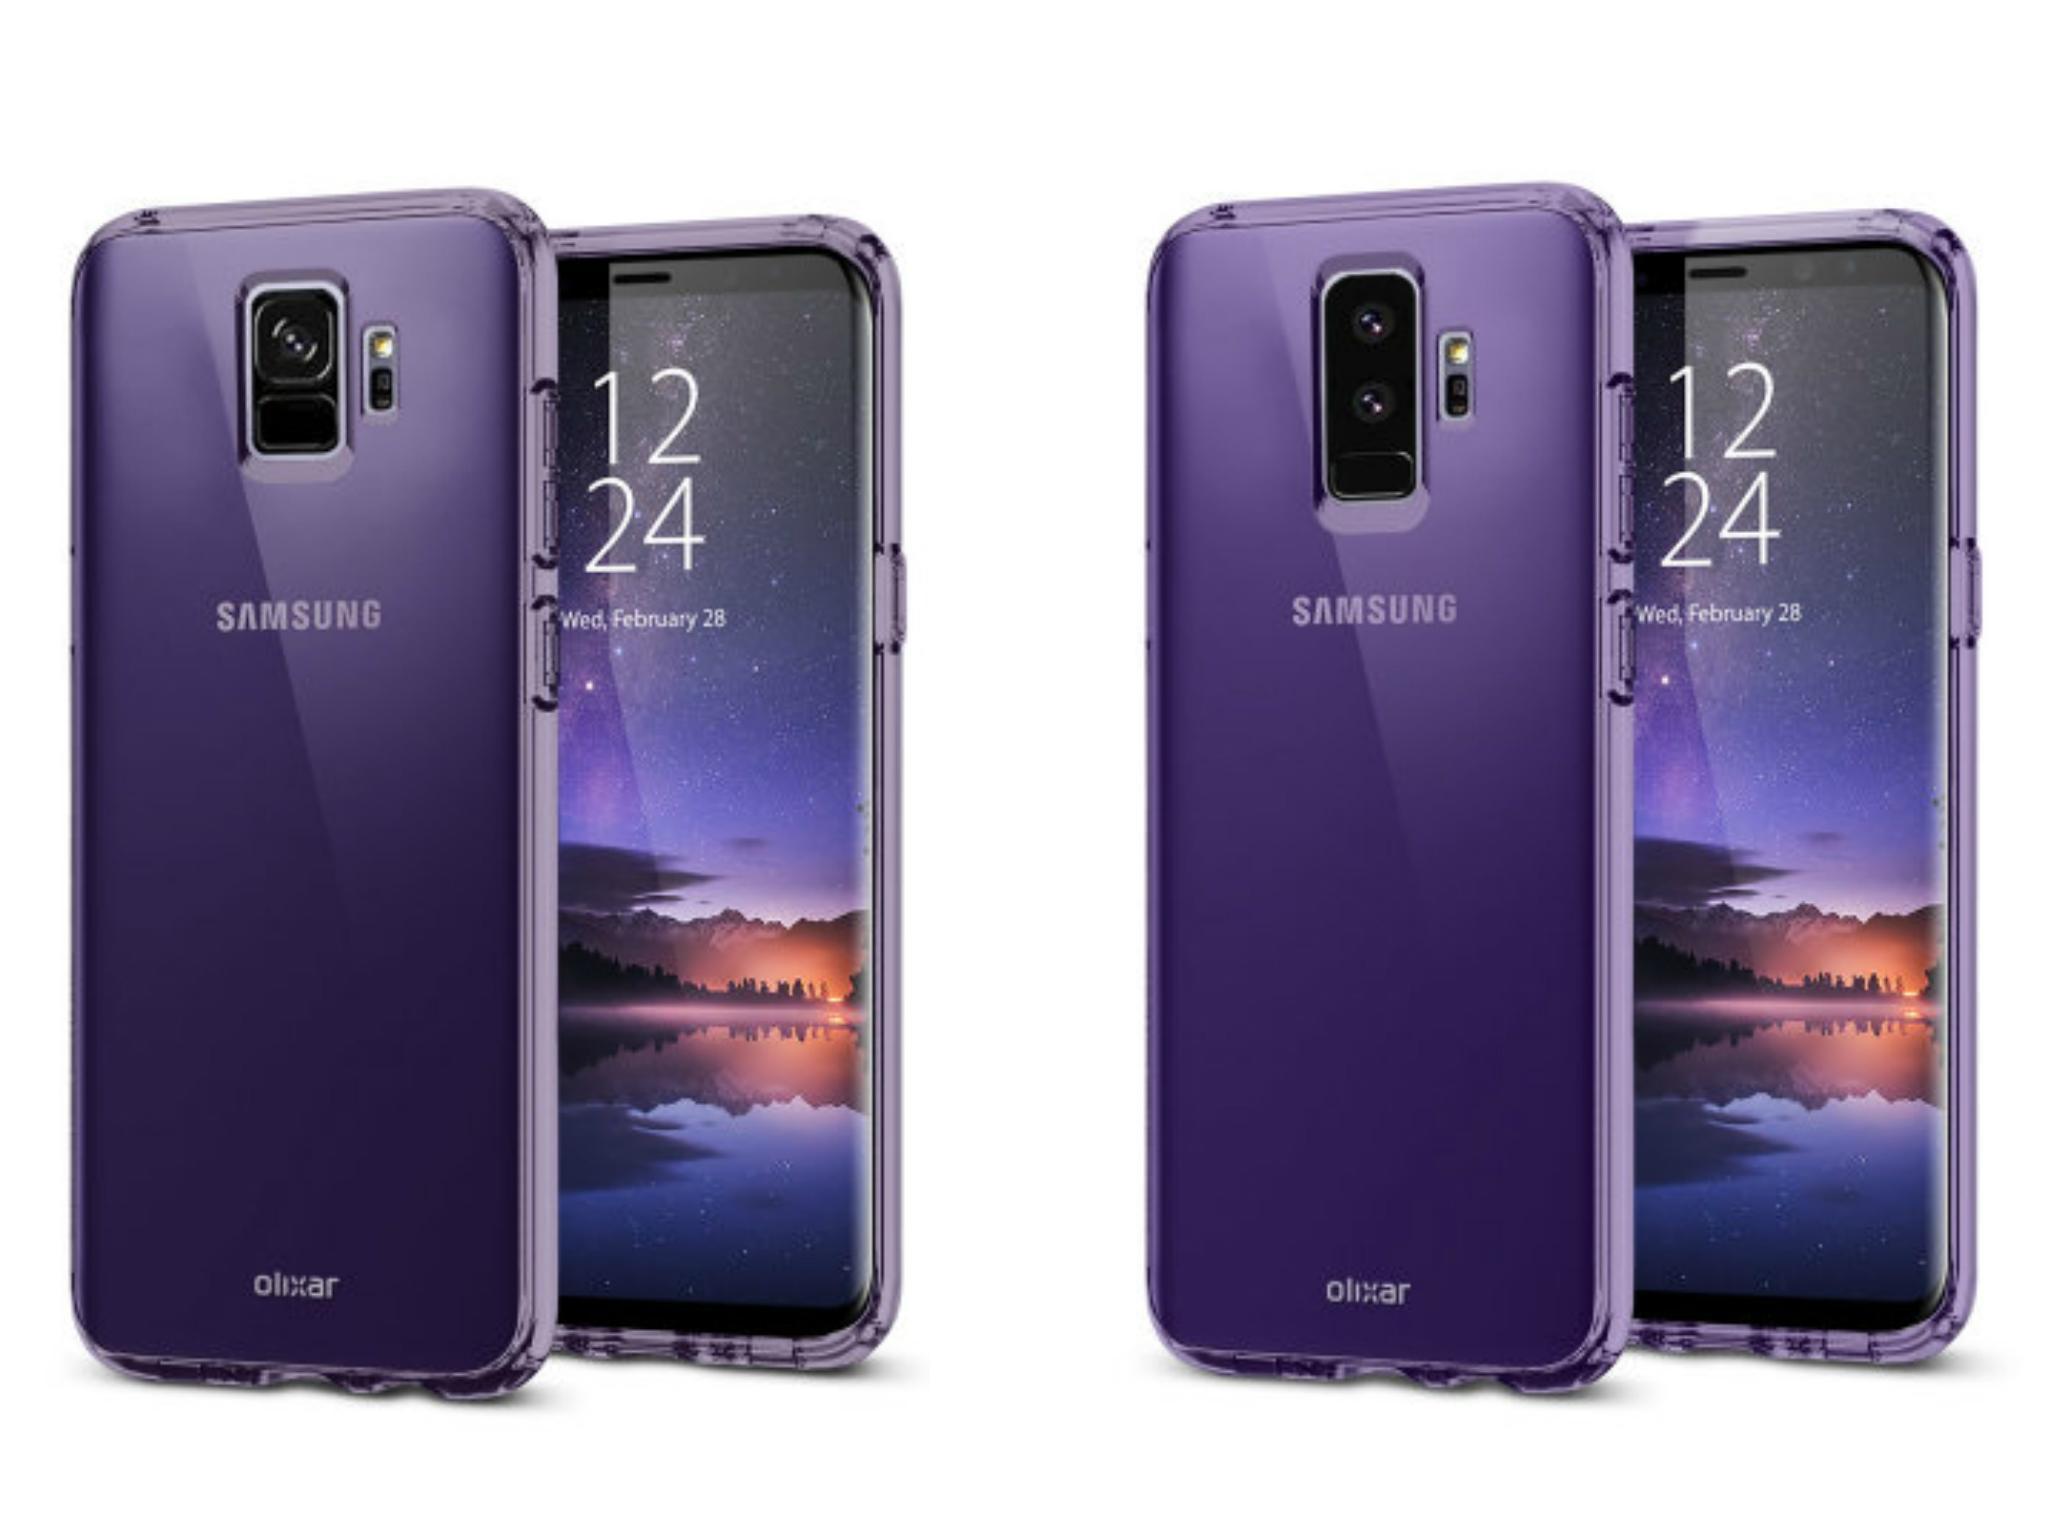 Samsung eyes over 25% jump in mobile phone sales in festive season